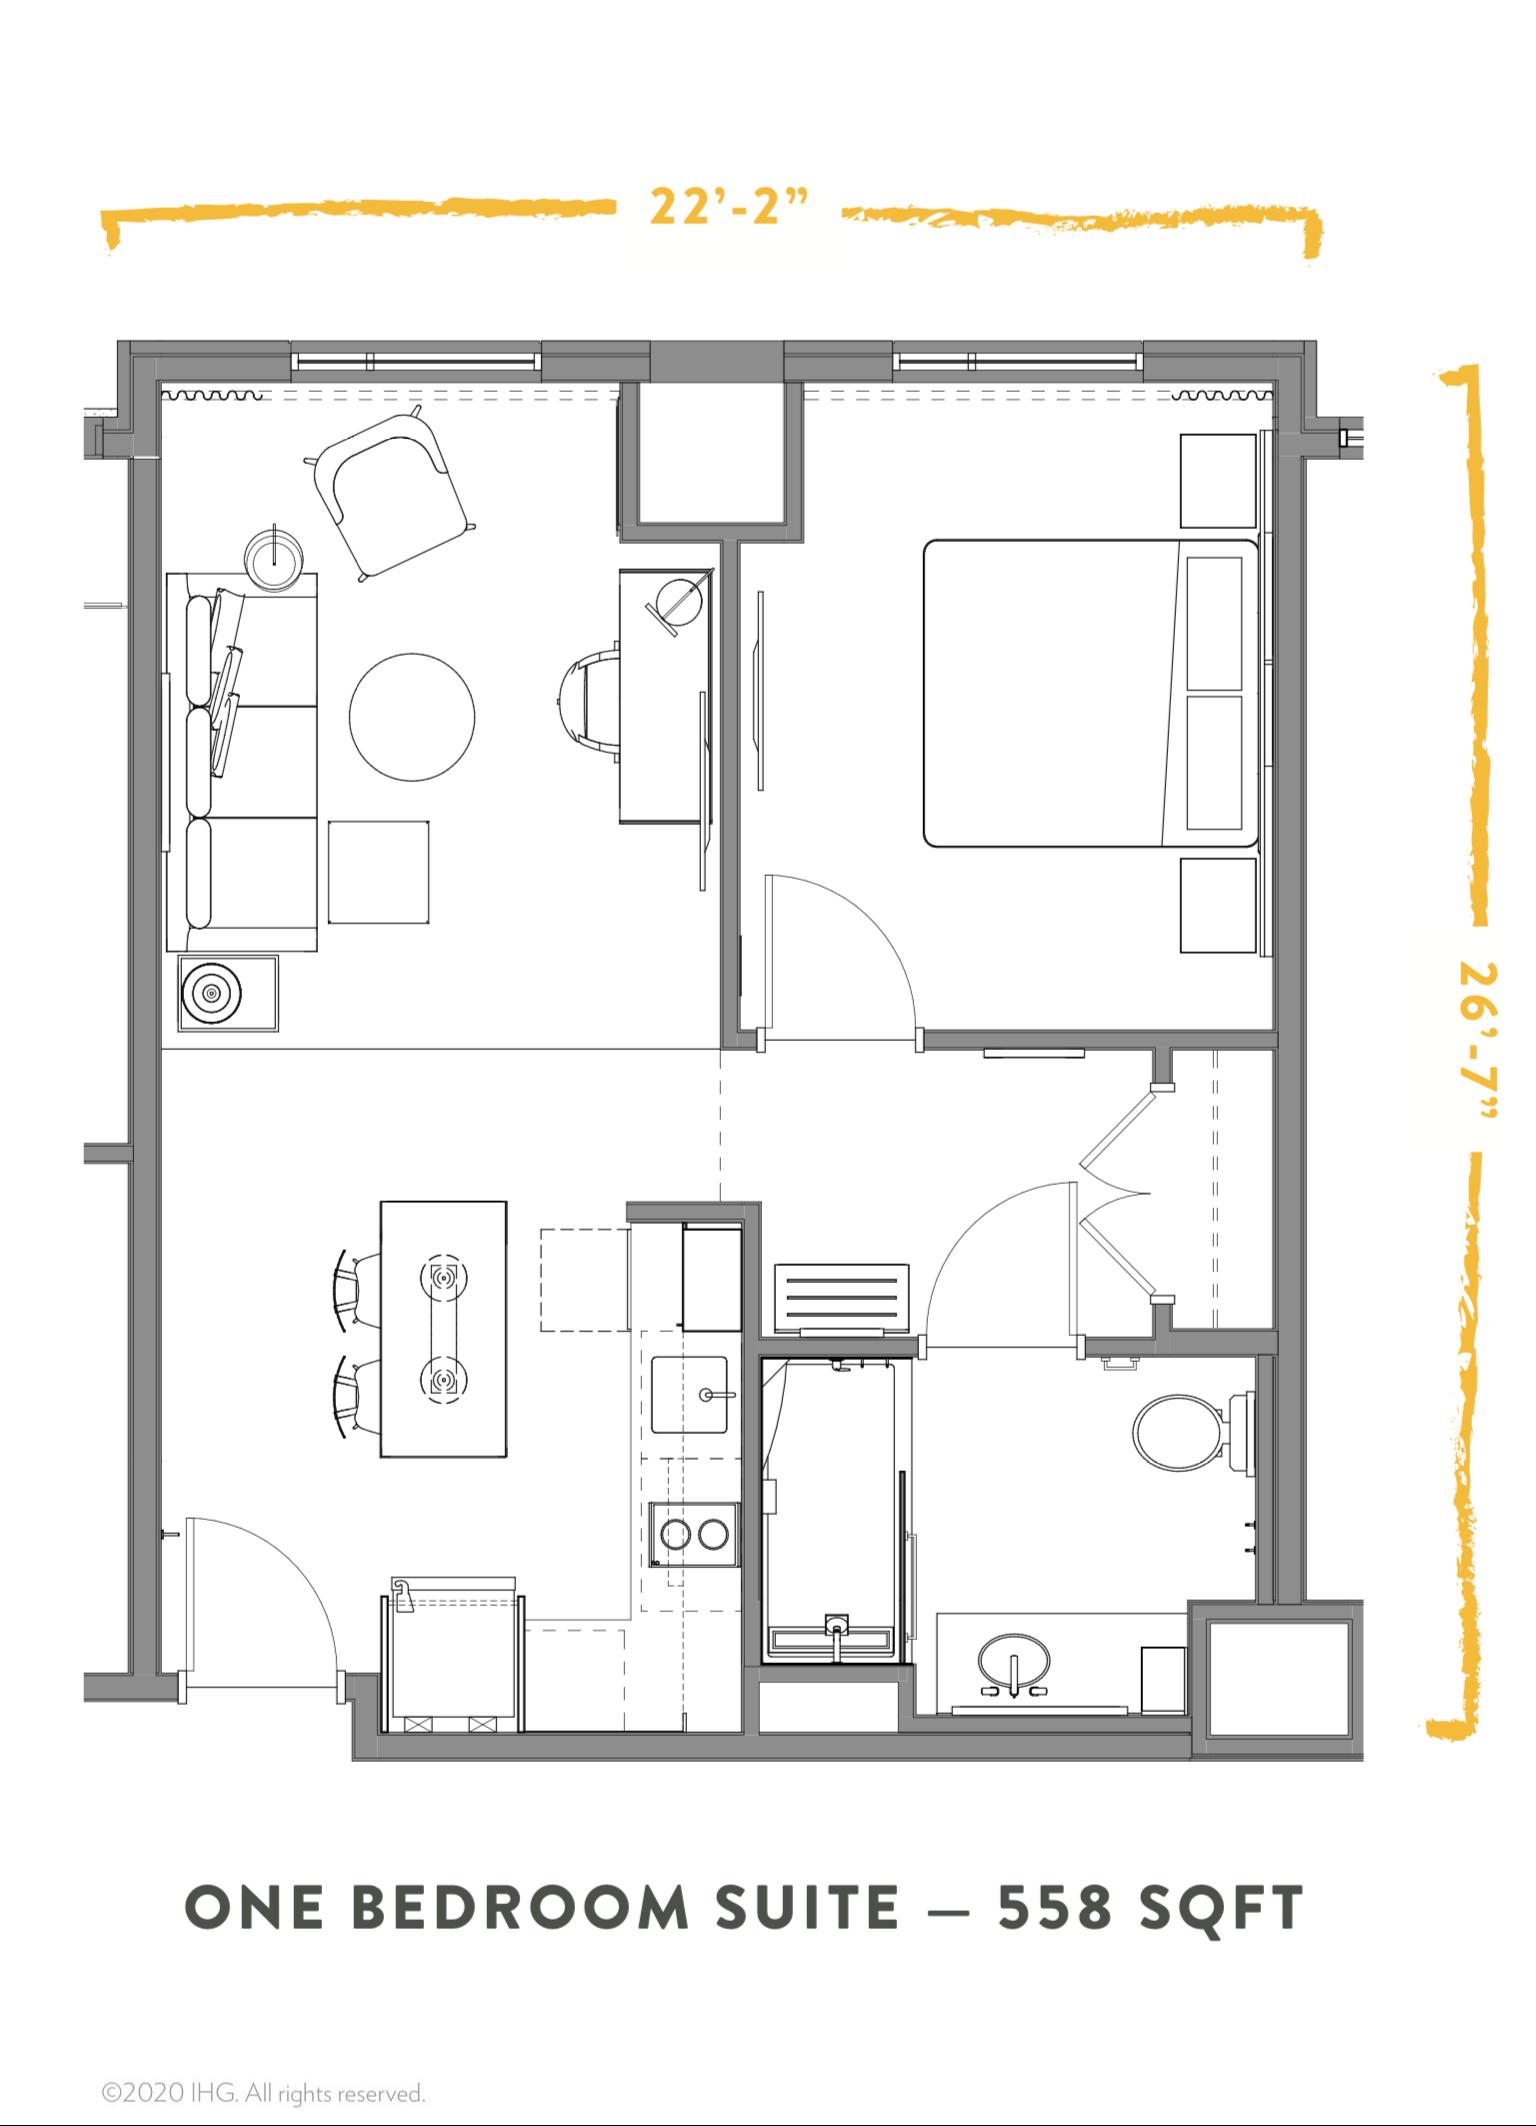 Pin By Samah Alkaff On Caravana Layout Hotel Suite Floor Plan Condo Floor Plans Hotel Suite Plan